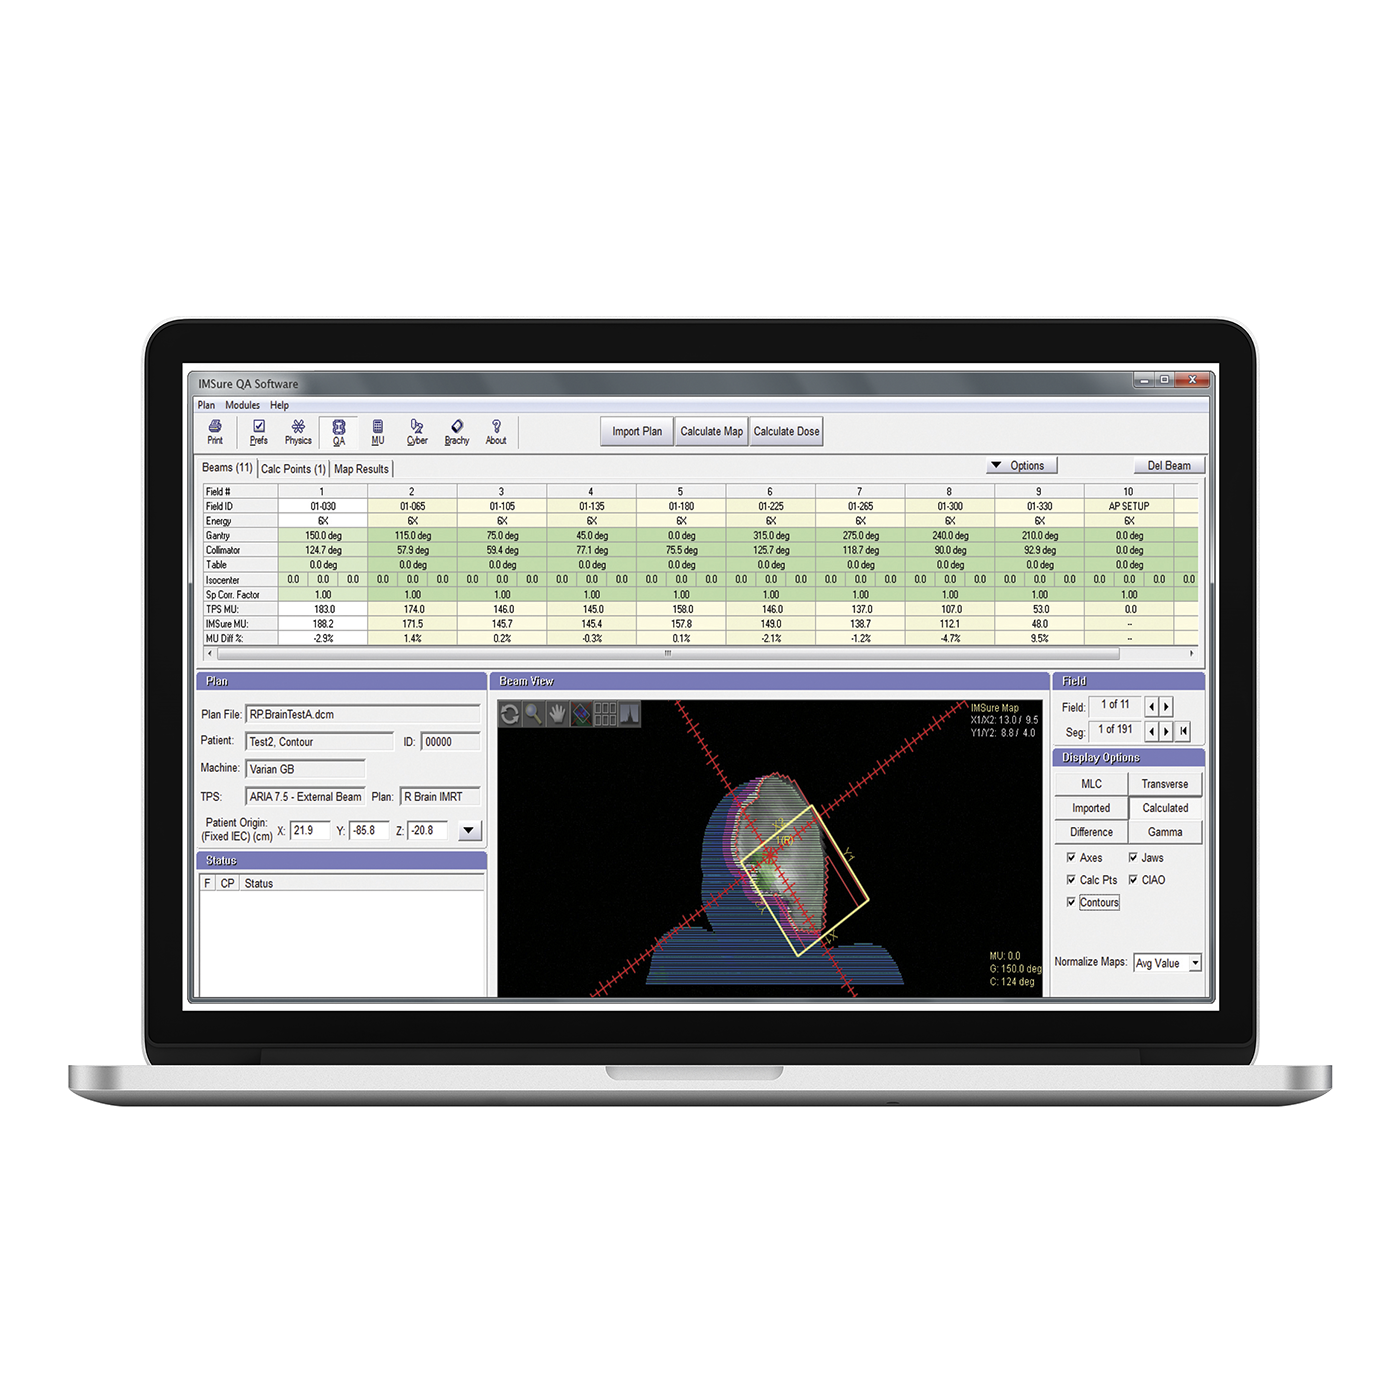 Imsure laptop 1400